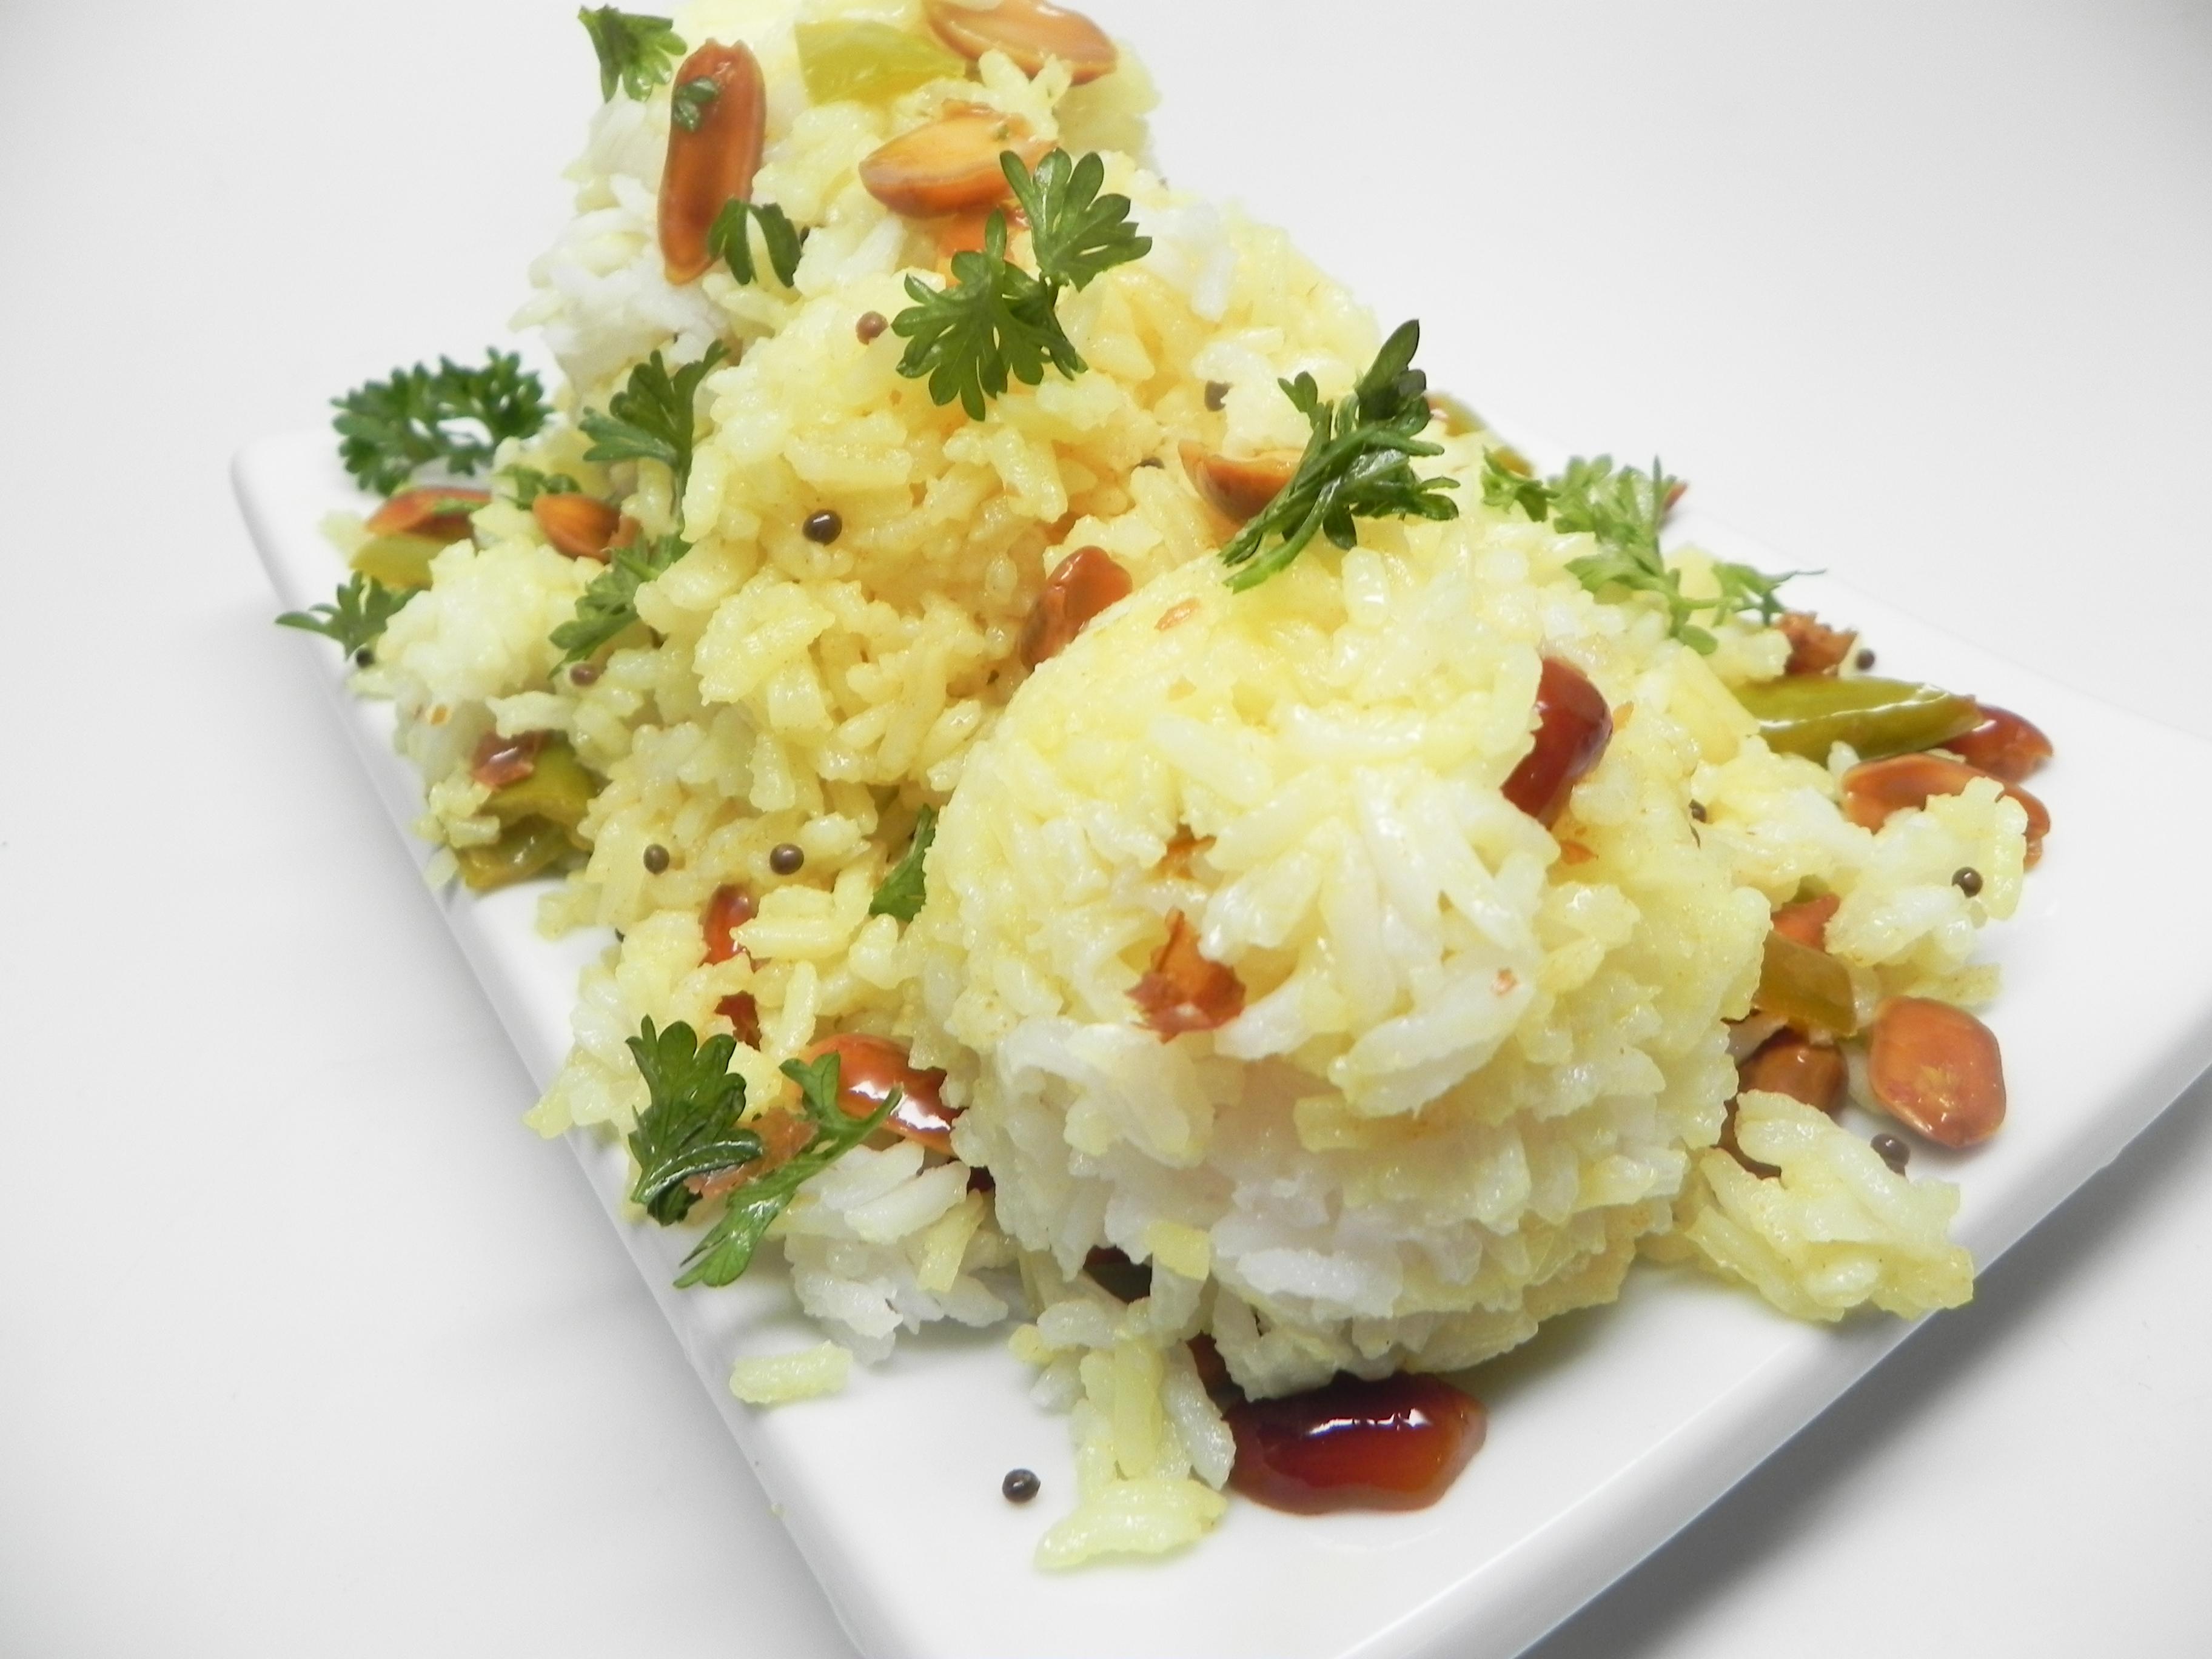 South Indian-Style Lemon Rice